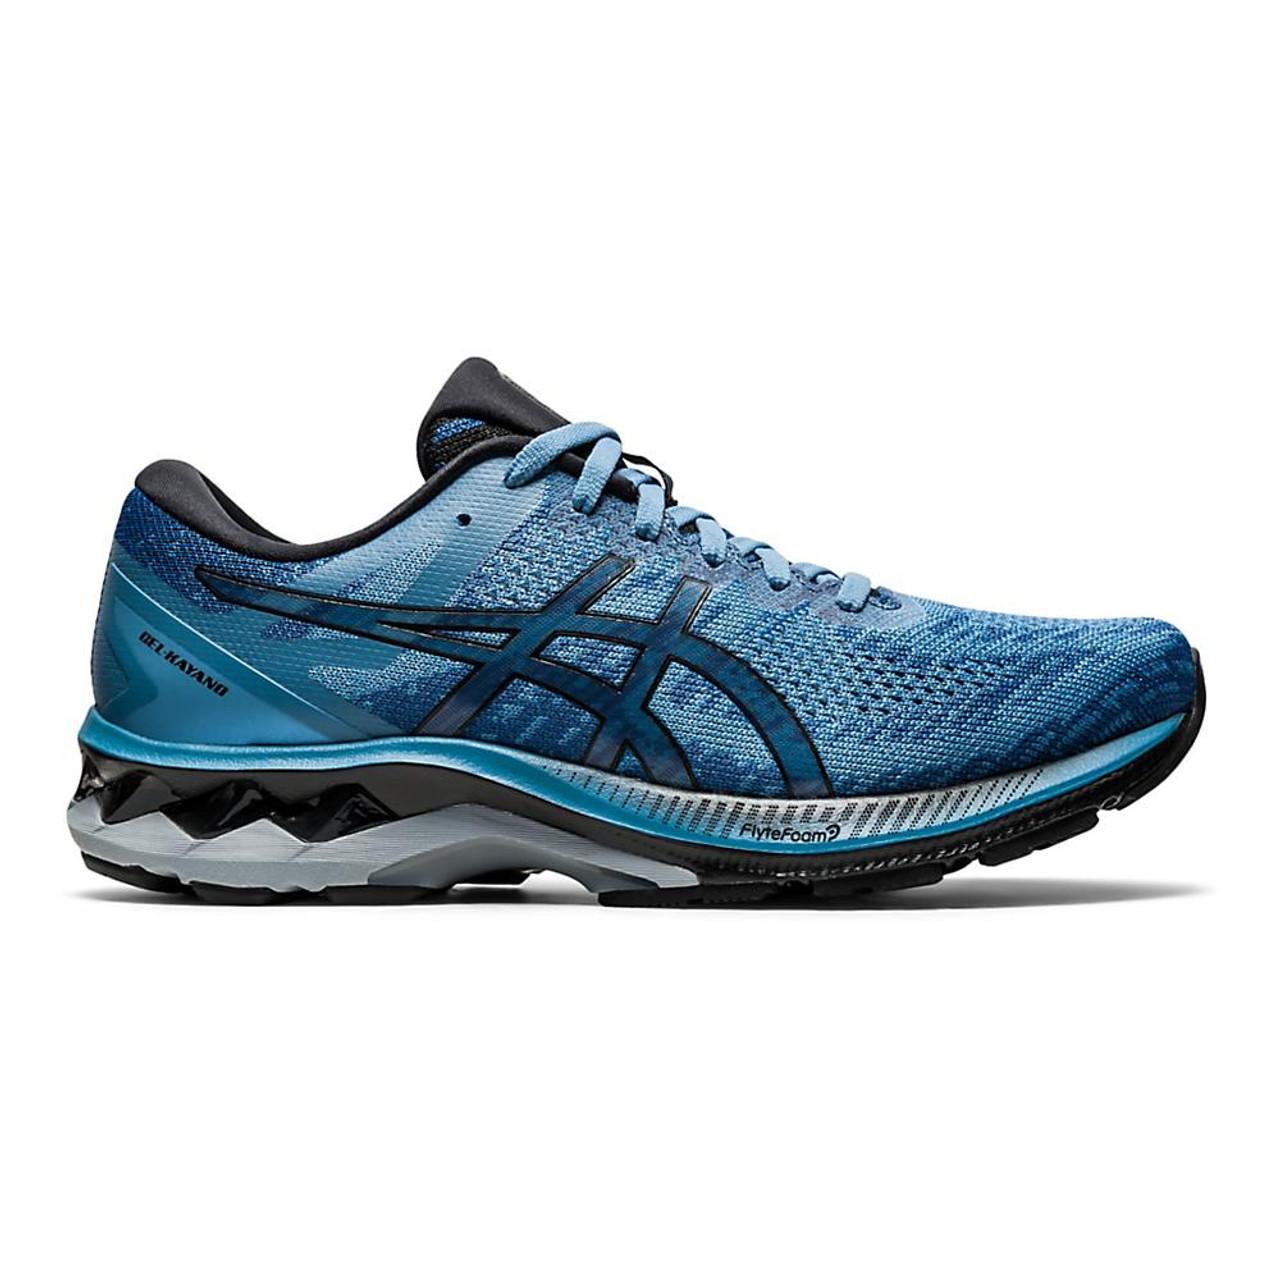 Amabilidad Calumnia oro  Mens ASICS GEL-Kayano 27 MK Running shoes   Free Shipping